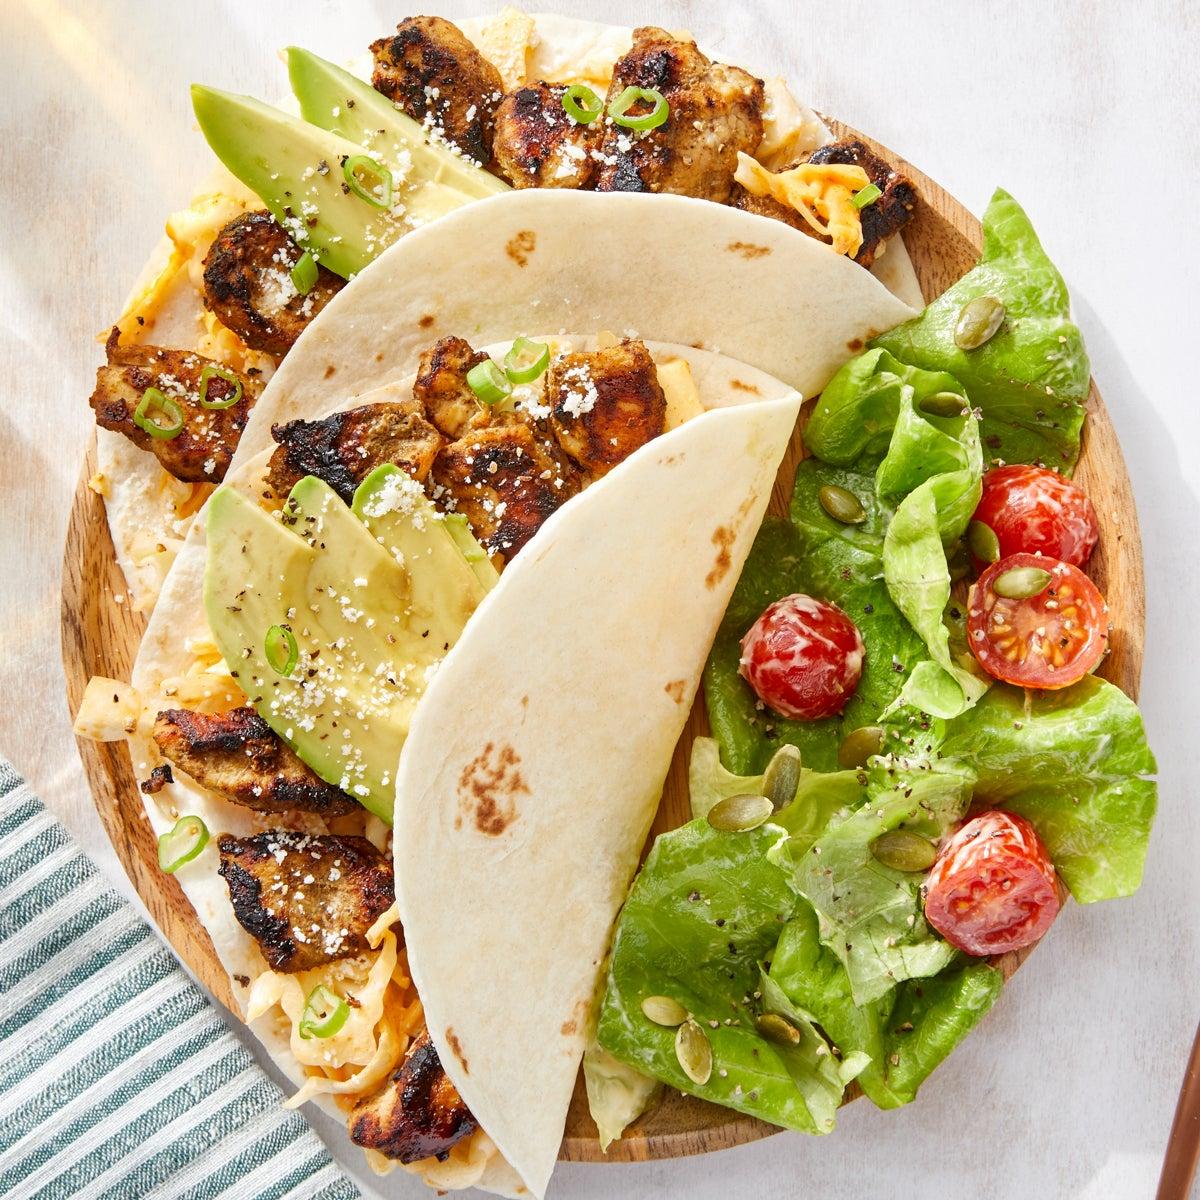 Jerk Chicken Tacos with Creamy Chipotle Cabbage Slaw & Avocado